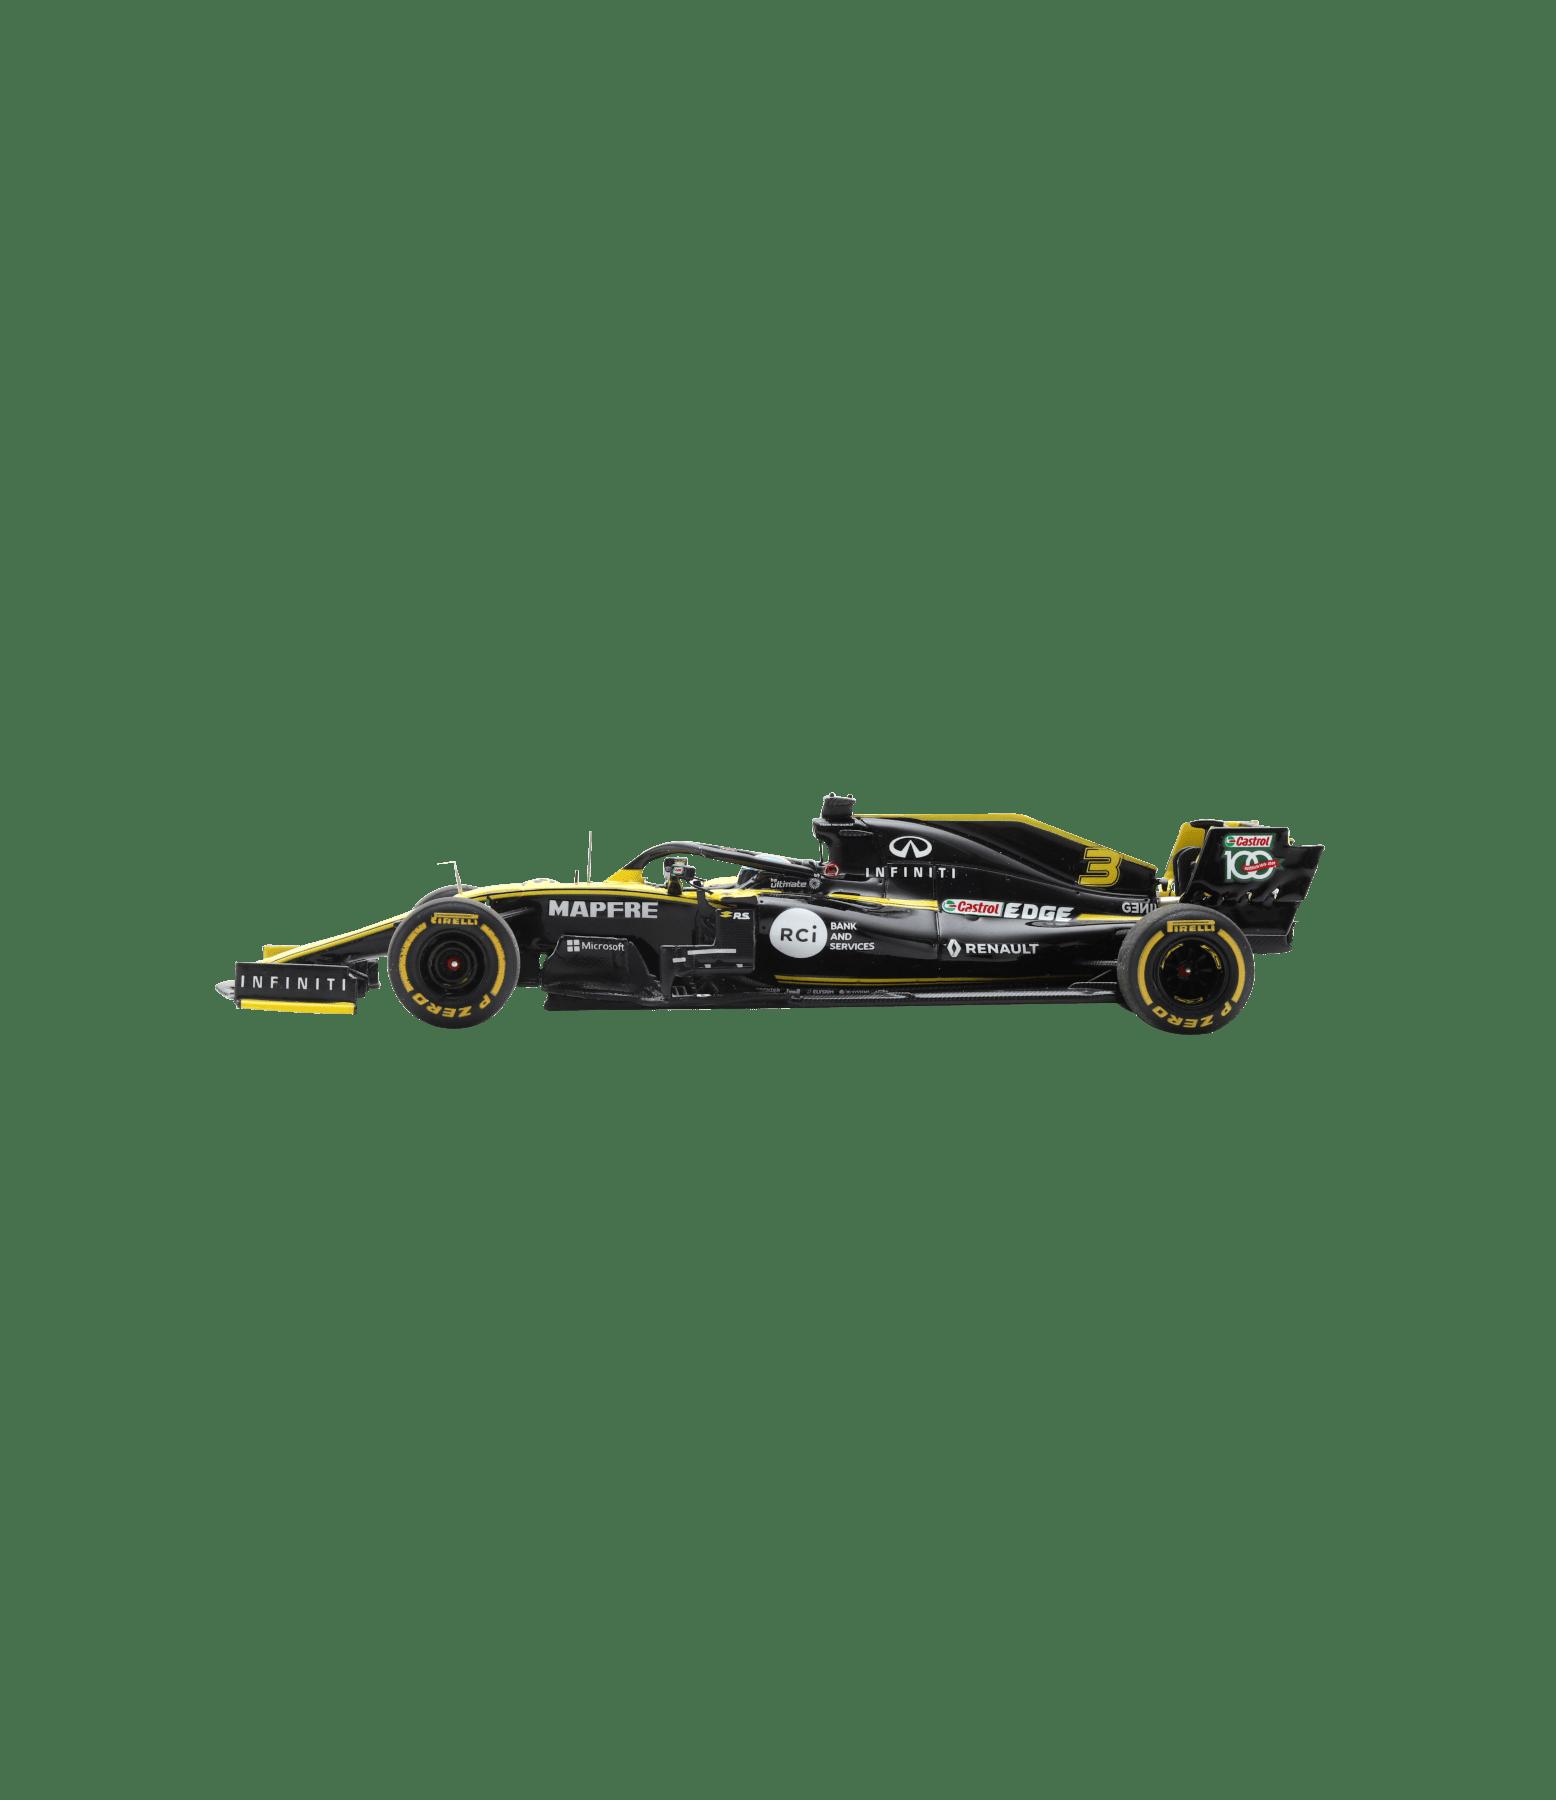 Miniature 1/43 RENAULT F1® Team 2019 R.S.19 #3 Daniel